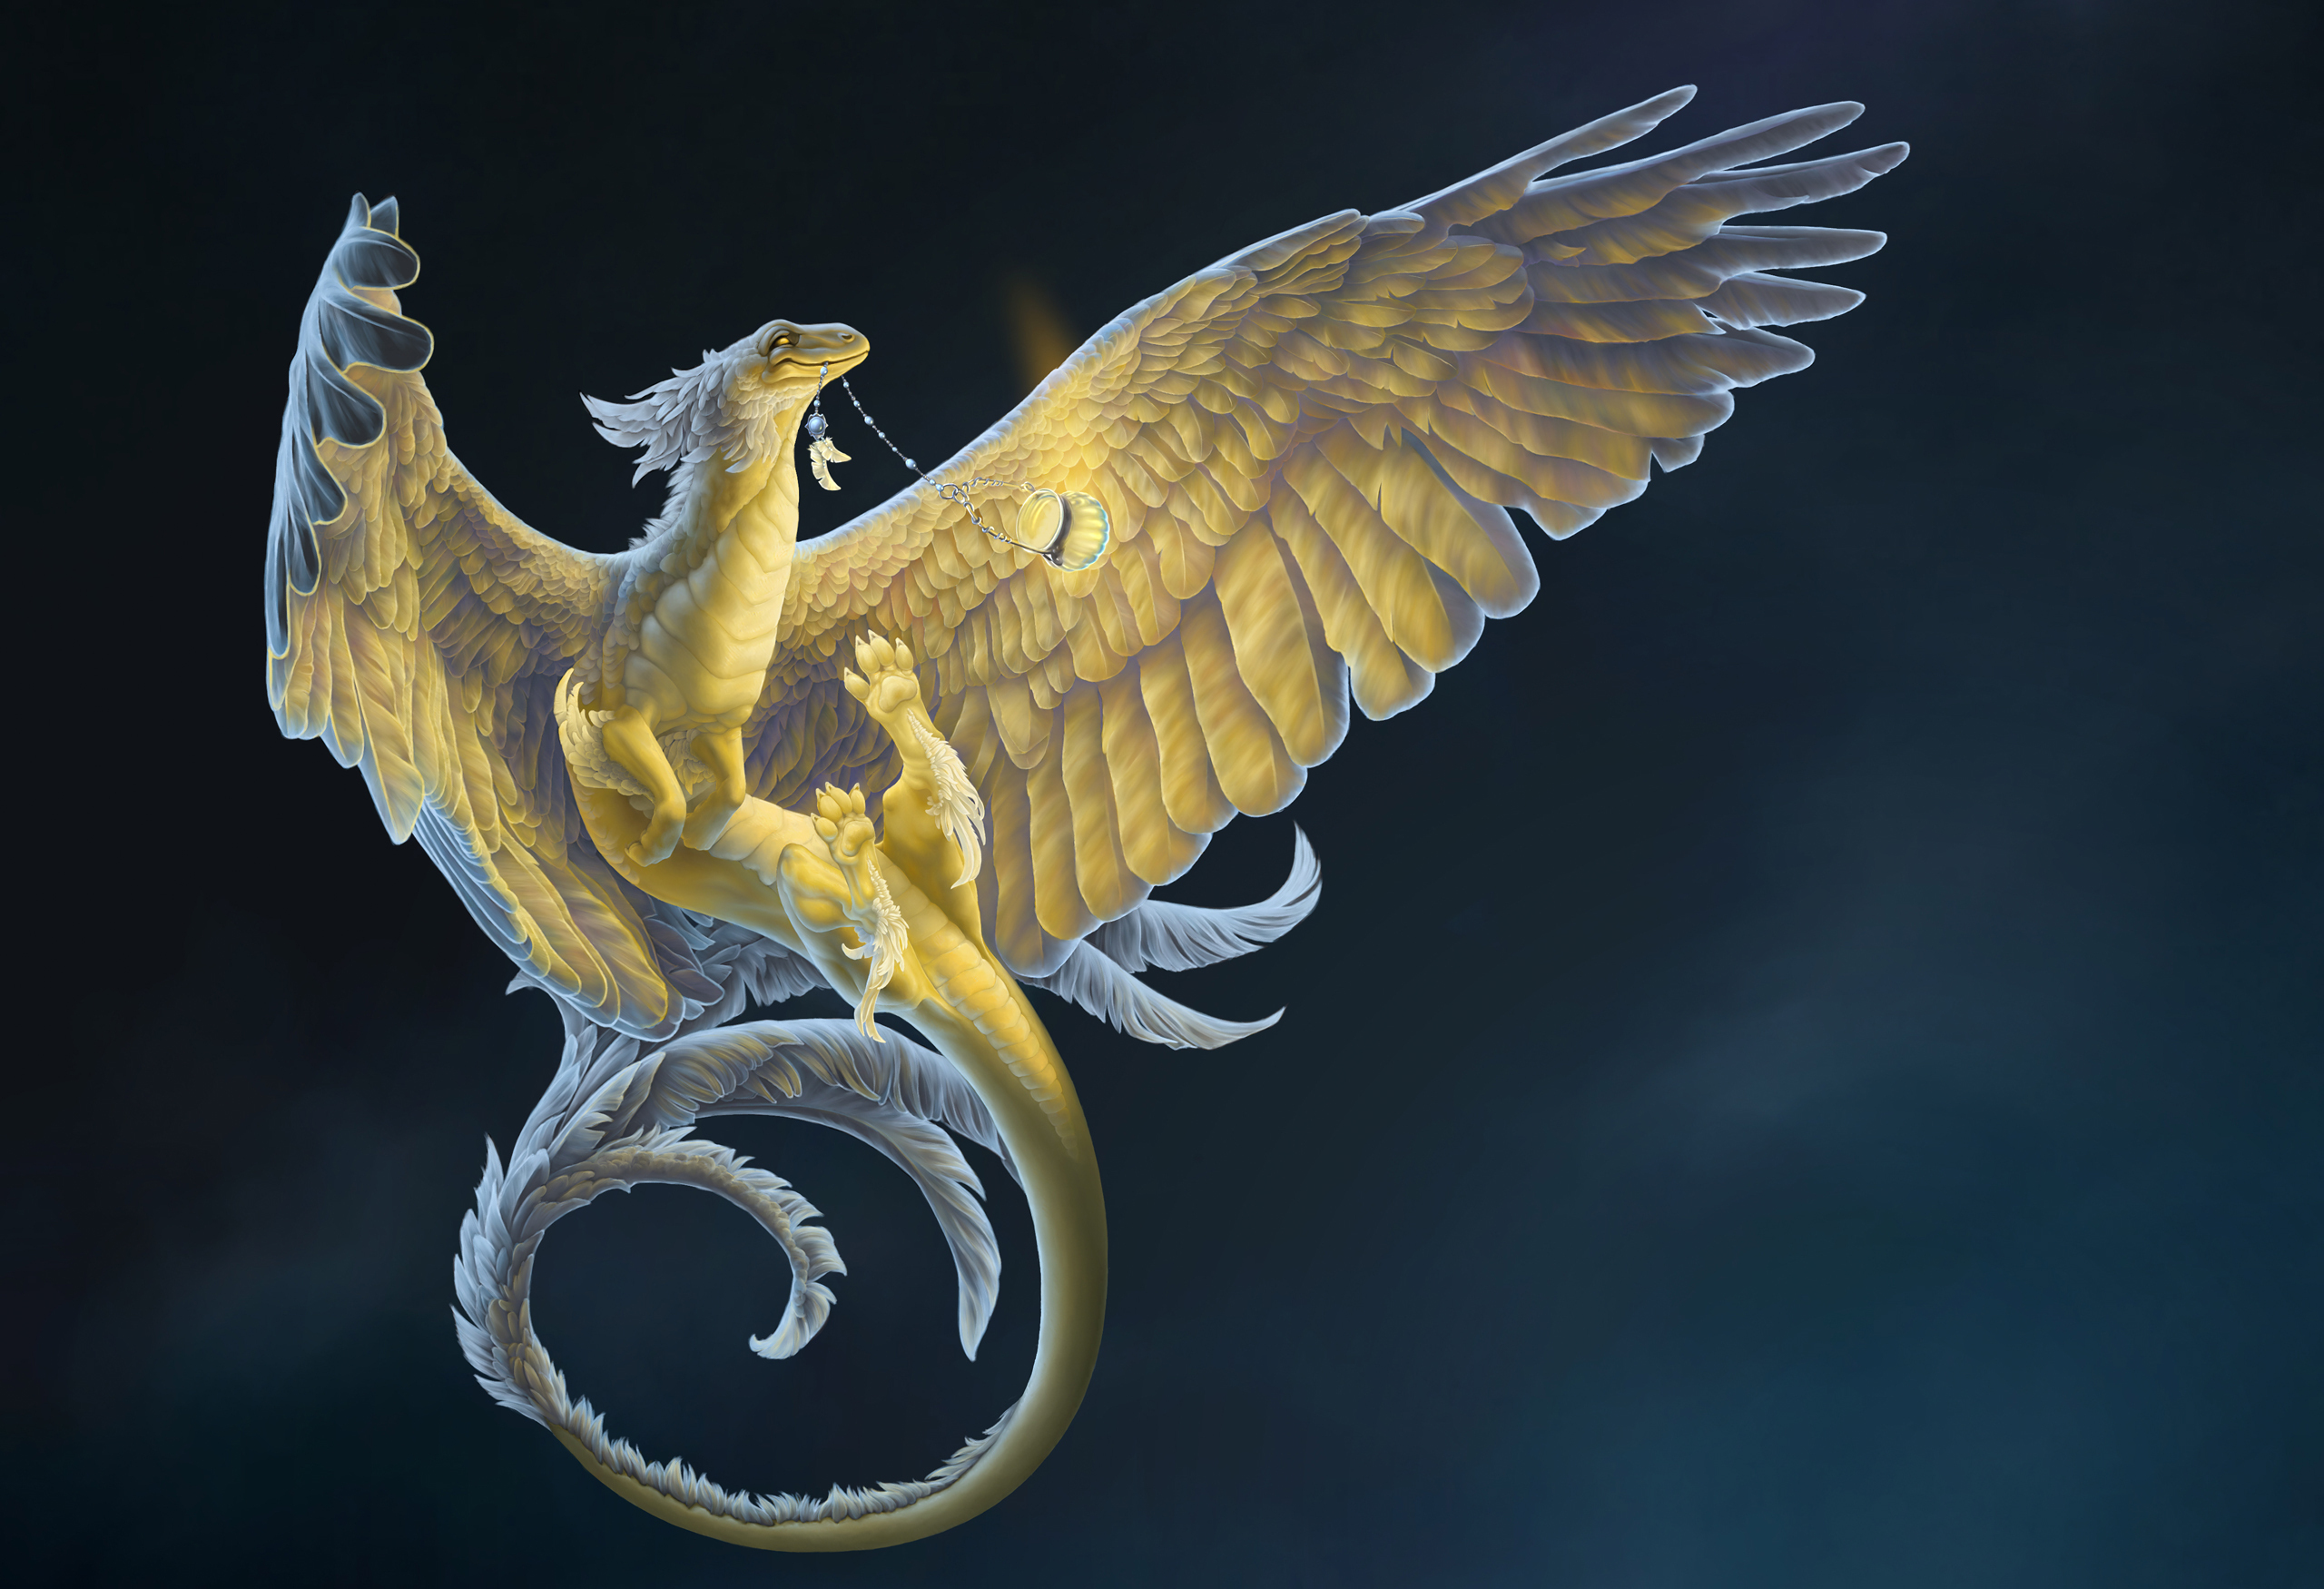 Fantasy - Artistic  Fantasy Griffin Creature Wallpaper